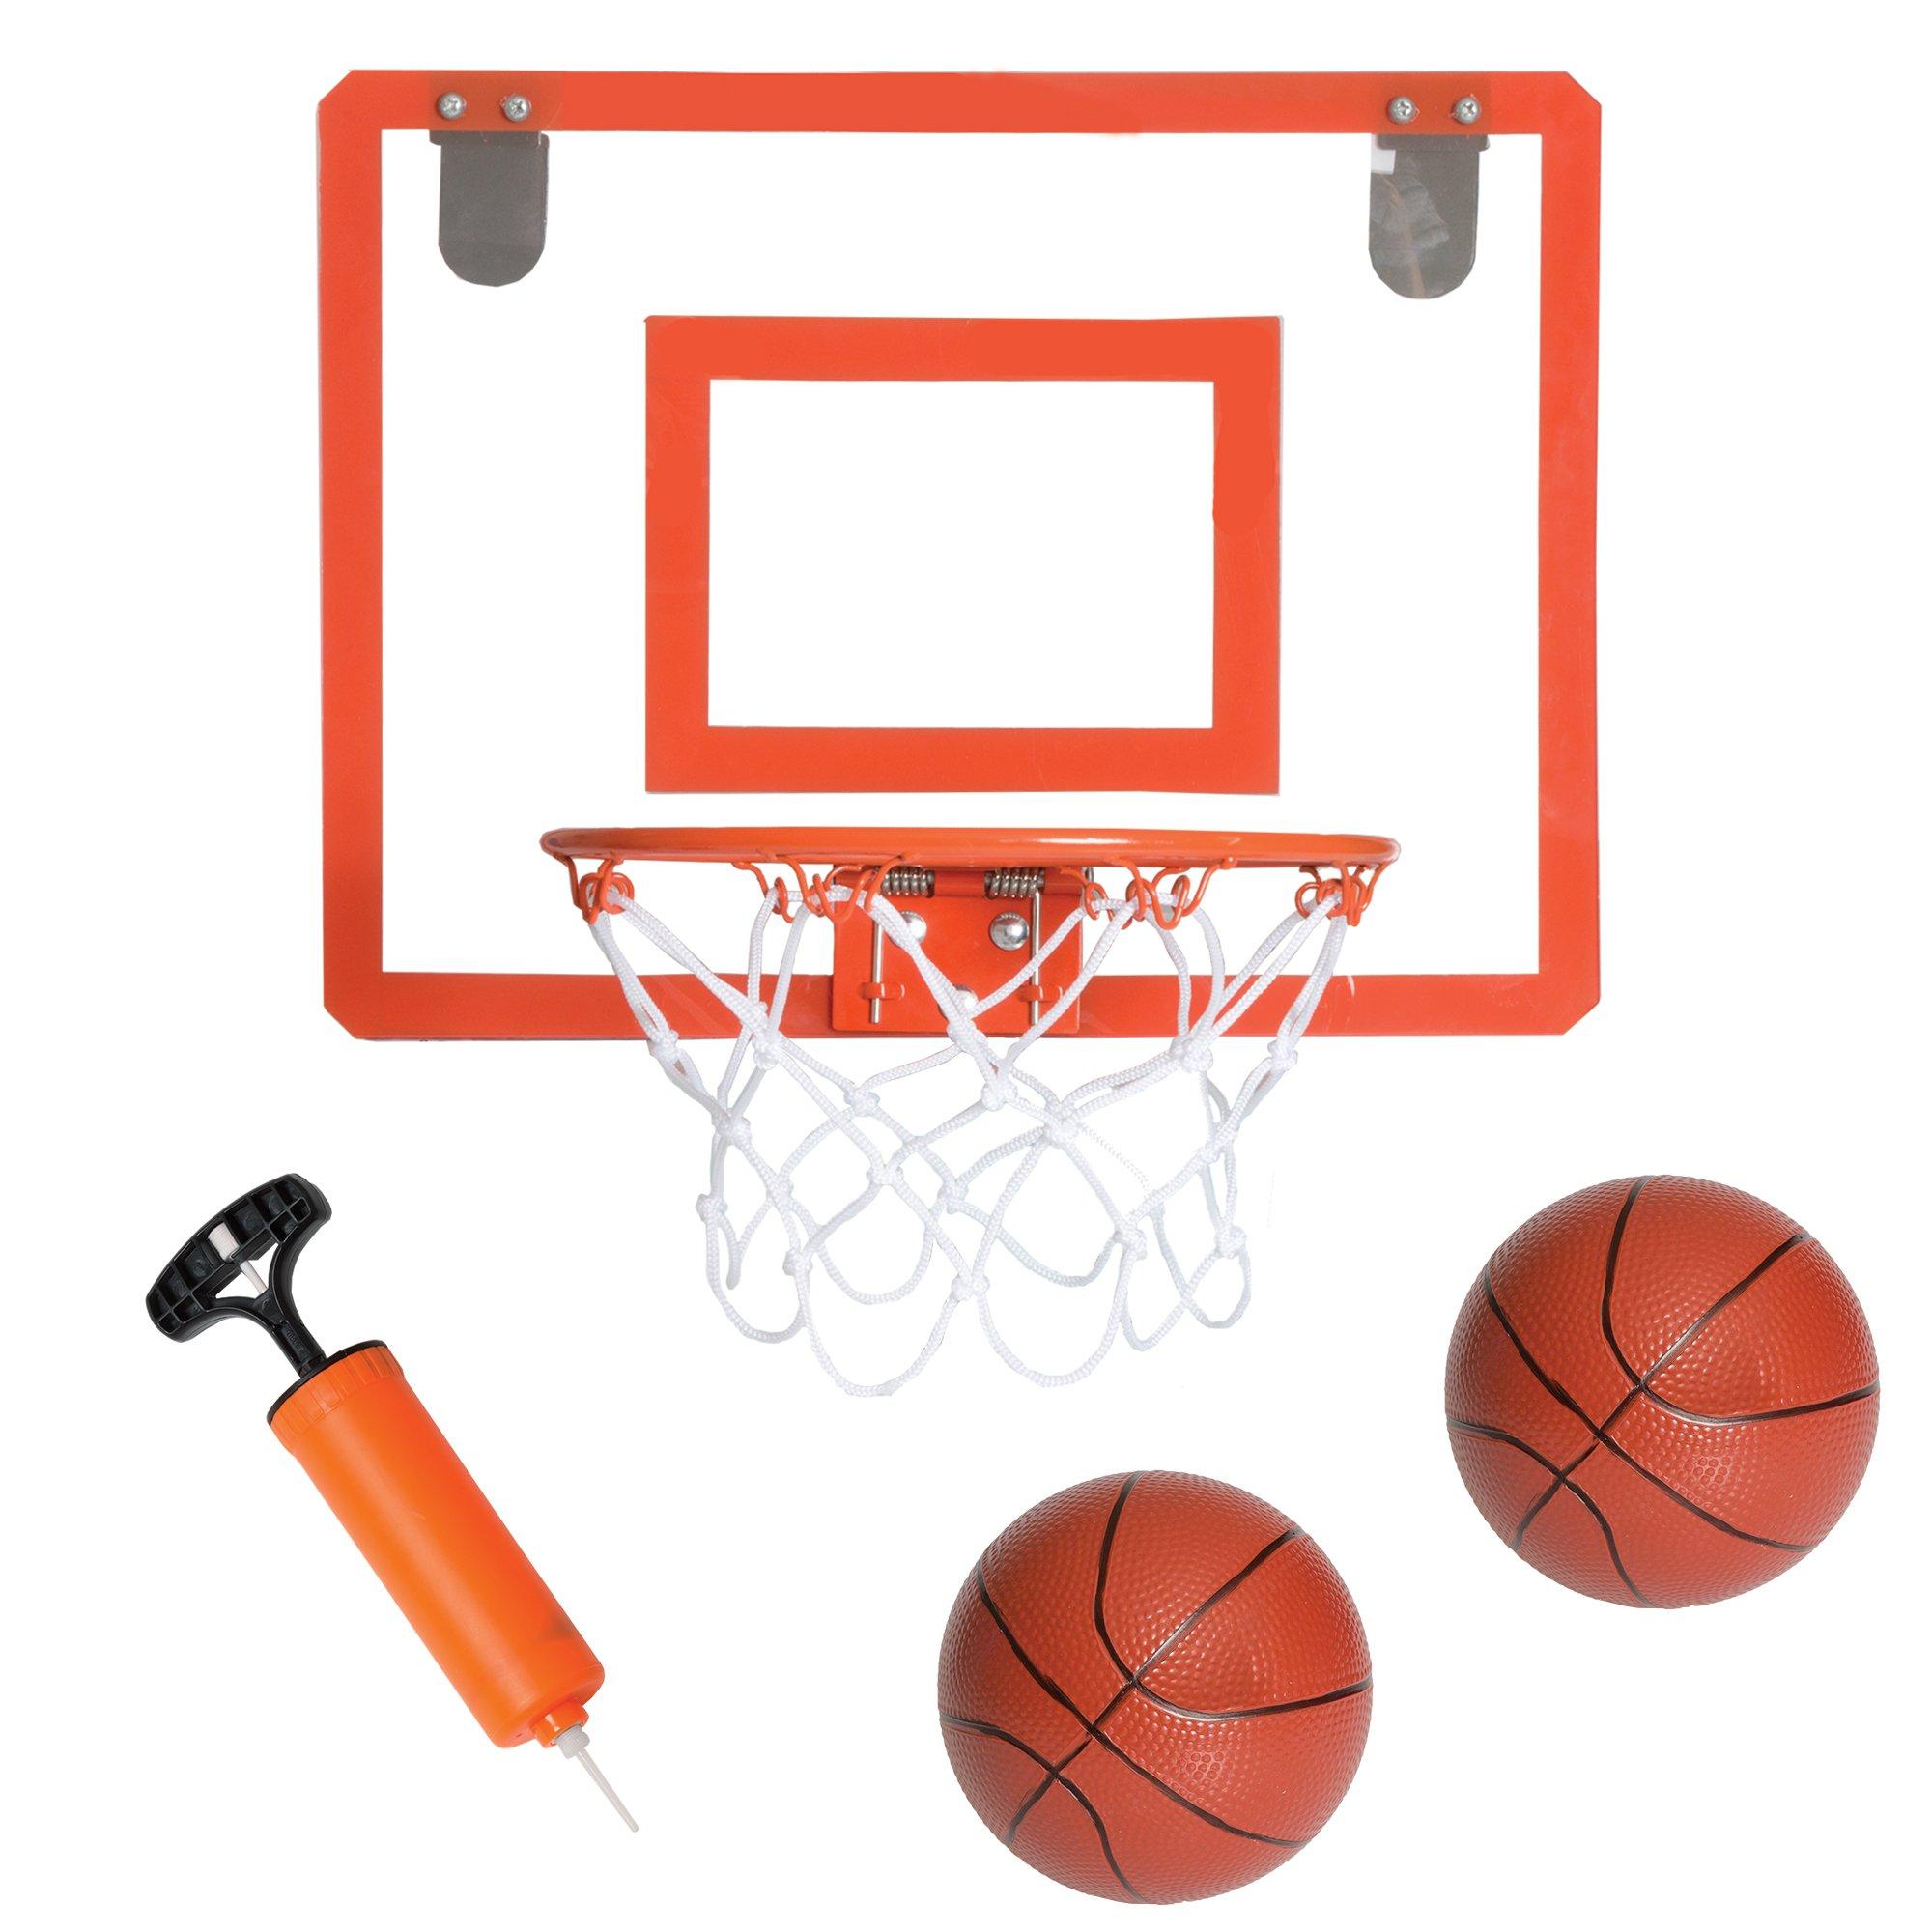 Play Platoon Mini Basketball Hoop for Door - 16 x 12 Inch Bedroom Basketball Hoop Indoors Set by Play Platoon (Image #1)